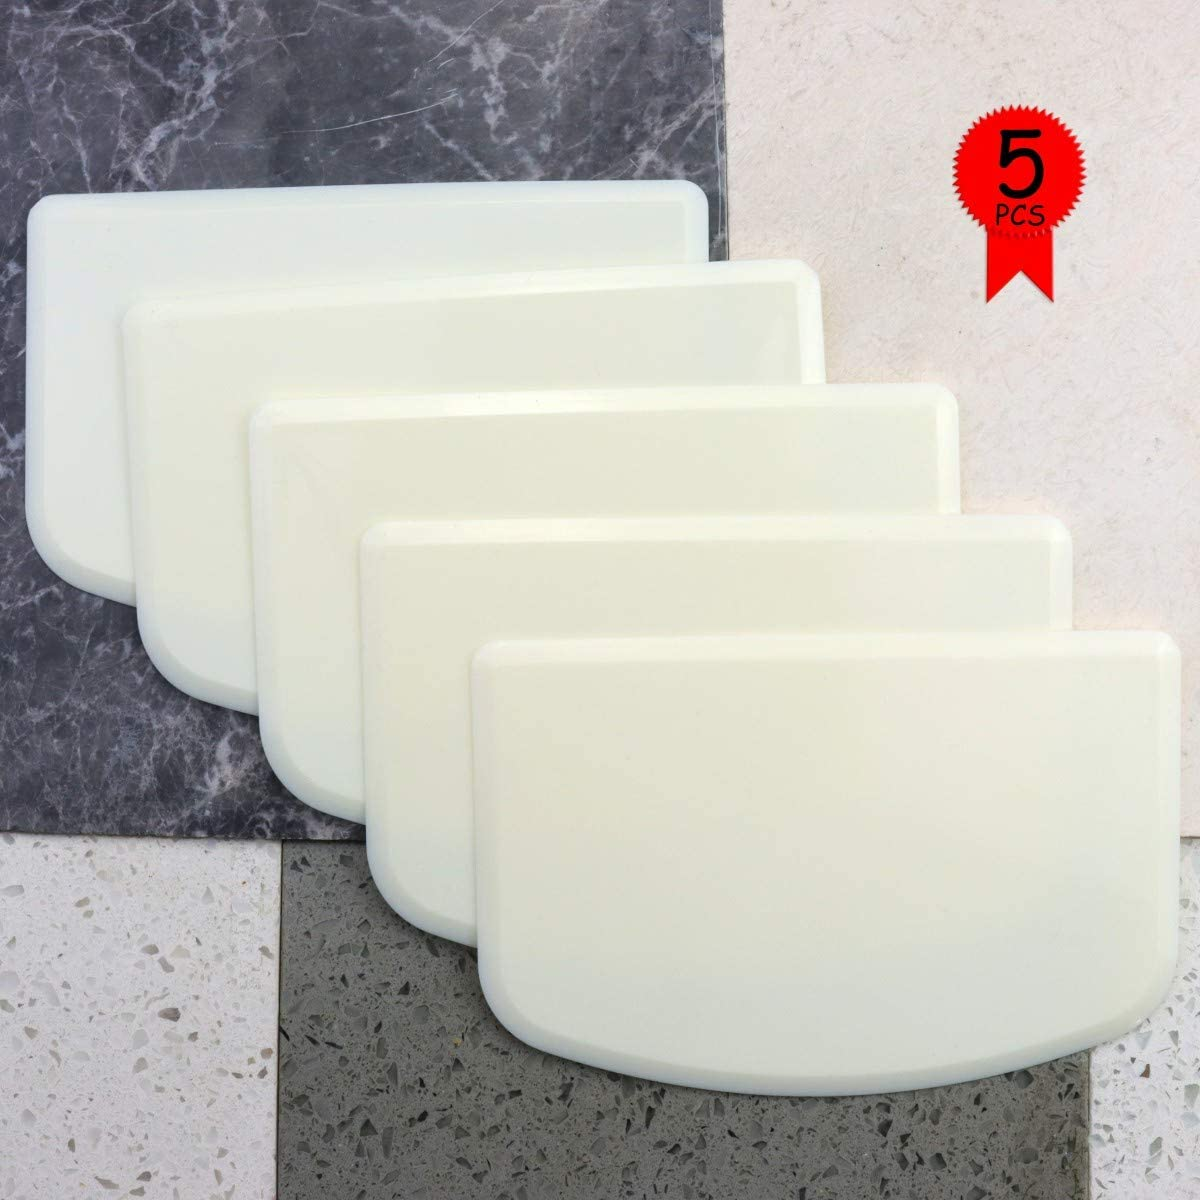 YG_Oline 6 Pcs Food-Grade White Dough Bowl Scraper, Multipurpose Hard Plastic Kitchen Dish Scraper, Smooth Edge Kit for Kitchen-Pizza, Dough, Cake, Pastry